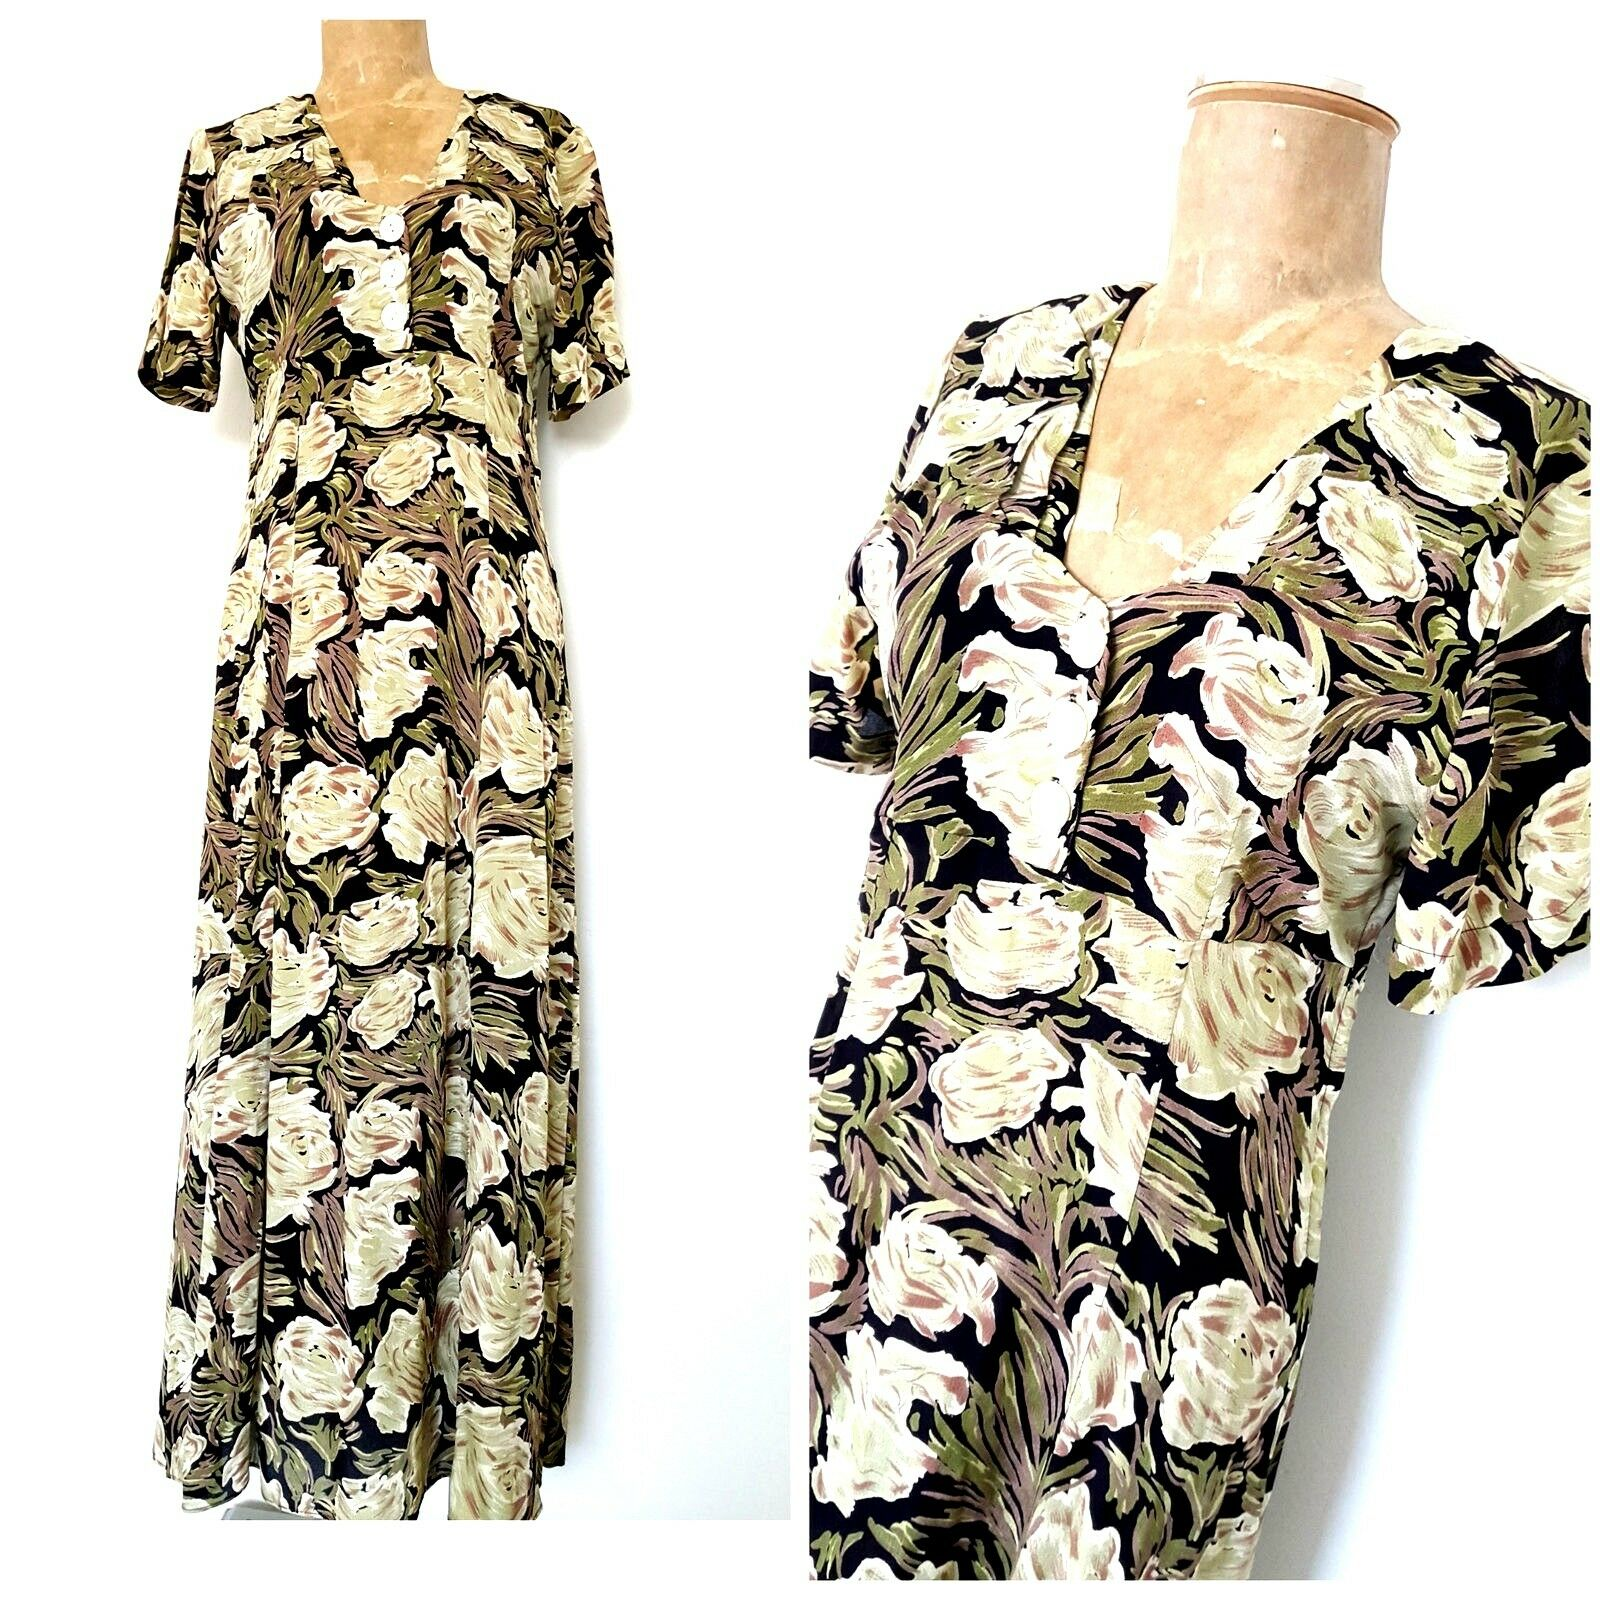 Vintage 90s Rockstar Floral Dress Größe Medium Great Gatsby Bias Cut Flapper Gown